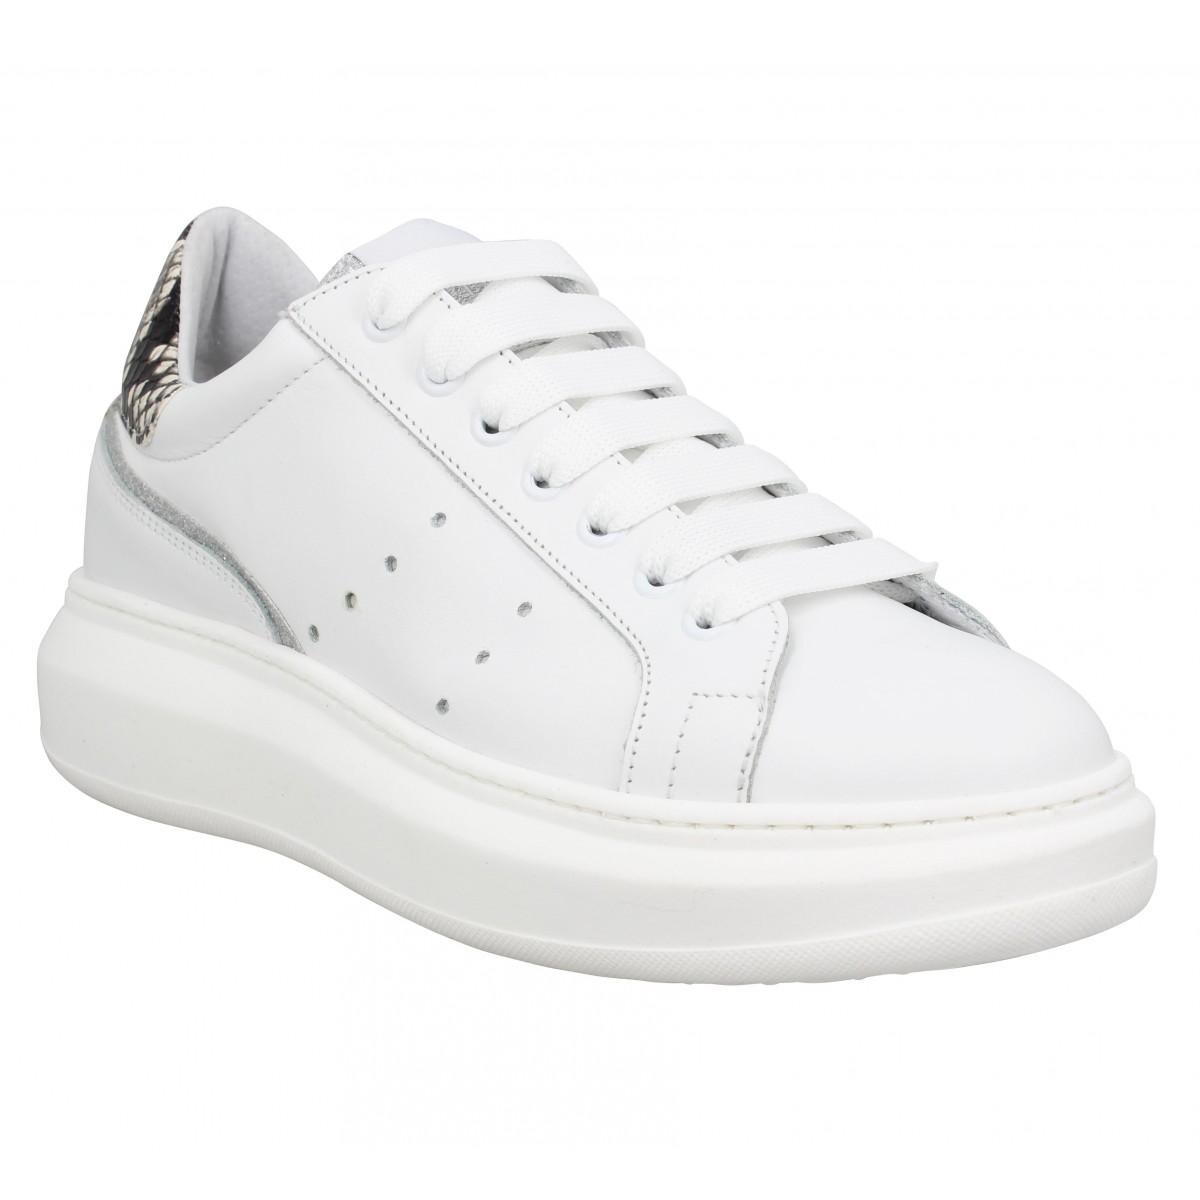 Semerdjian Femme 9911 Cuir -40-blanc